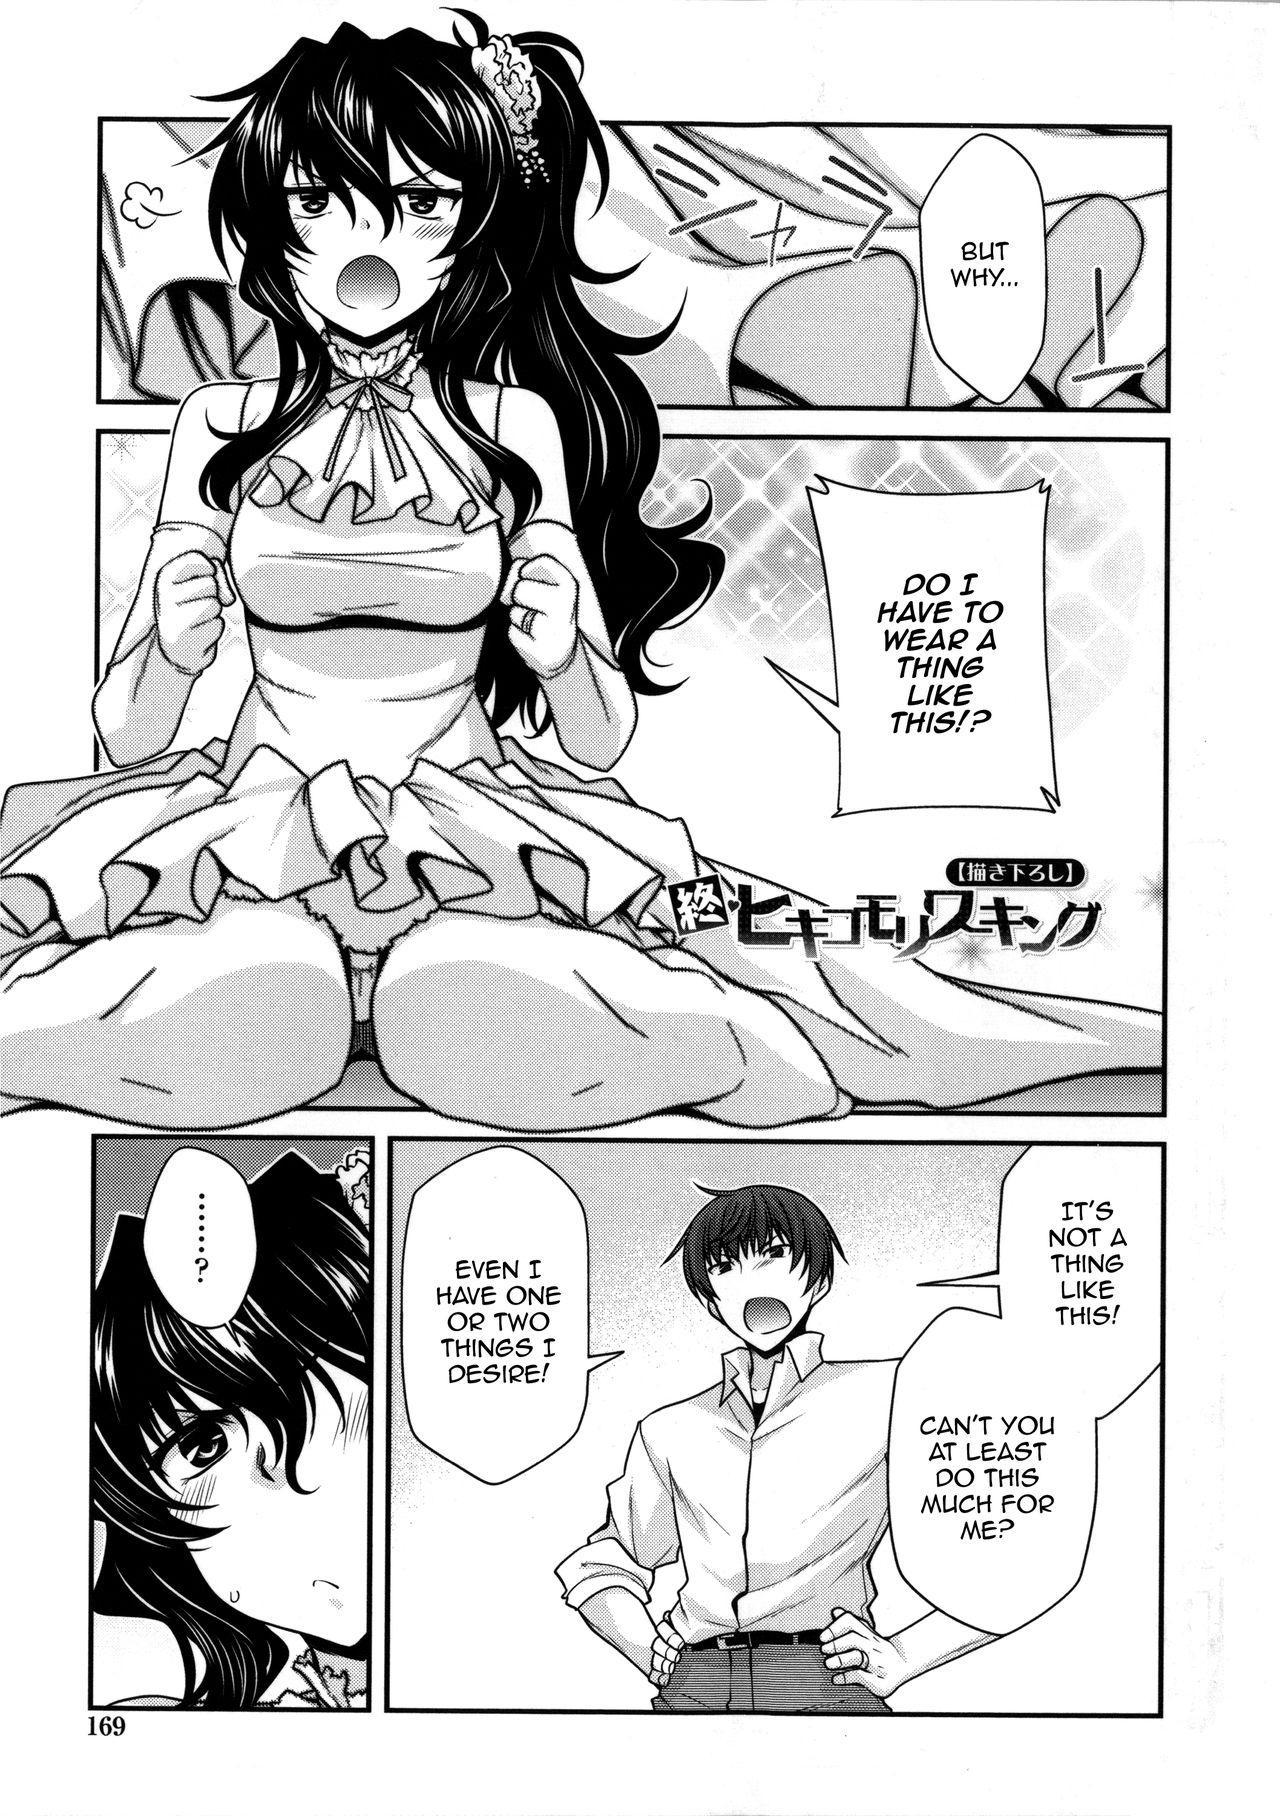 [Miyashiro Sousuke] Yamato Nadeshiko Chichi Henge - Yamato Nadeshiko Breast Changes Ch. 0-1, 4, 7-9 [English] 84